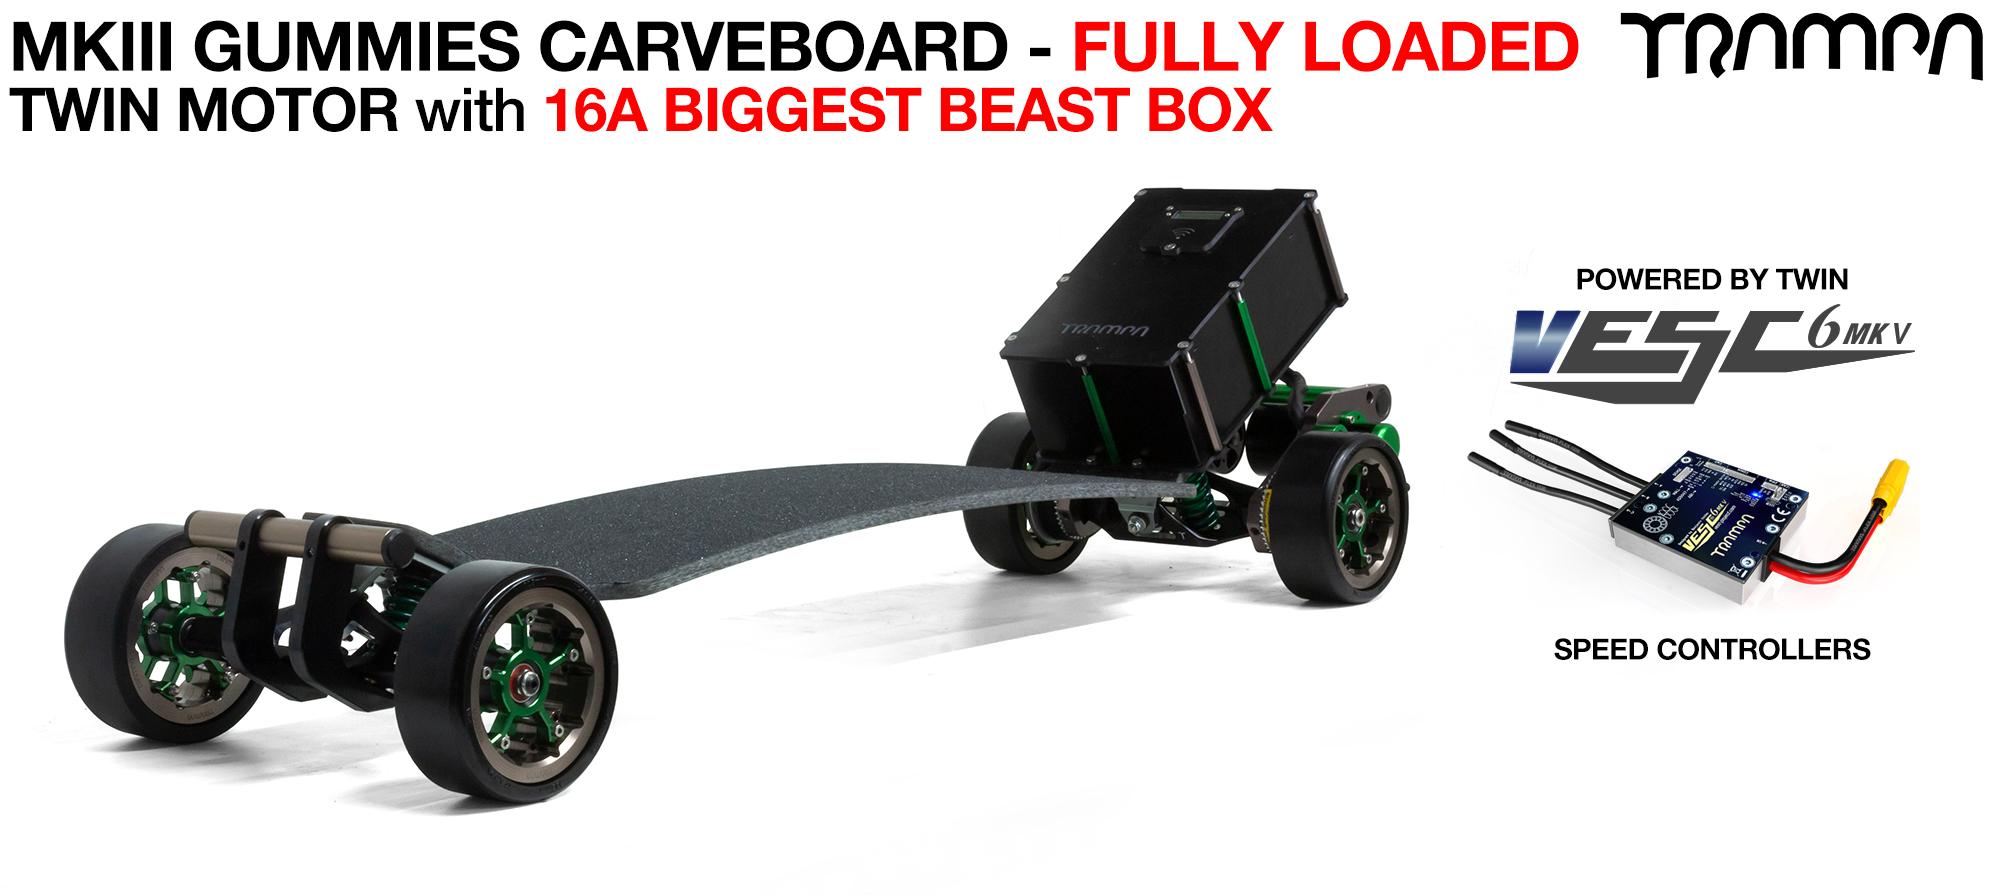 MkIII GUMMIE ELECTRIC Carveboard 3 in 1 TWIN MOTOR with massive 16A BEAST Box Mini Spring Trucks & OFFSET MEGASTAR Wheels